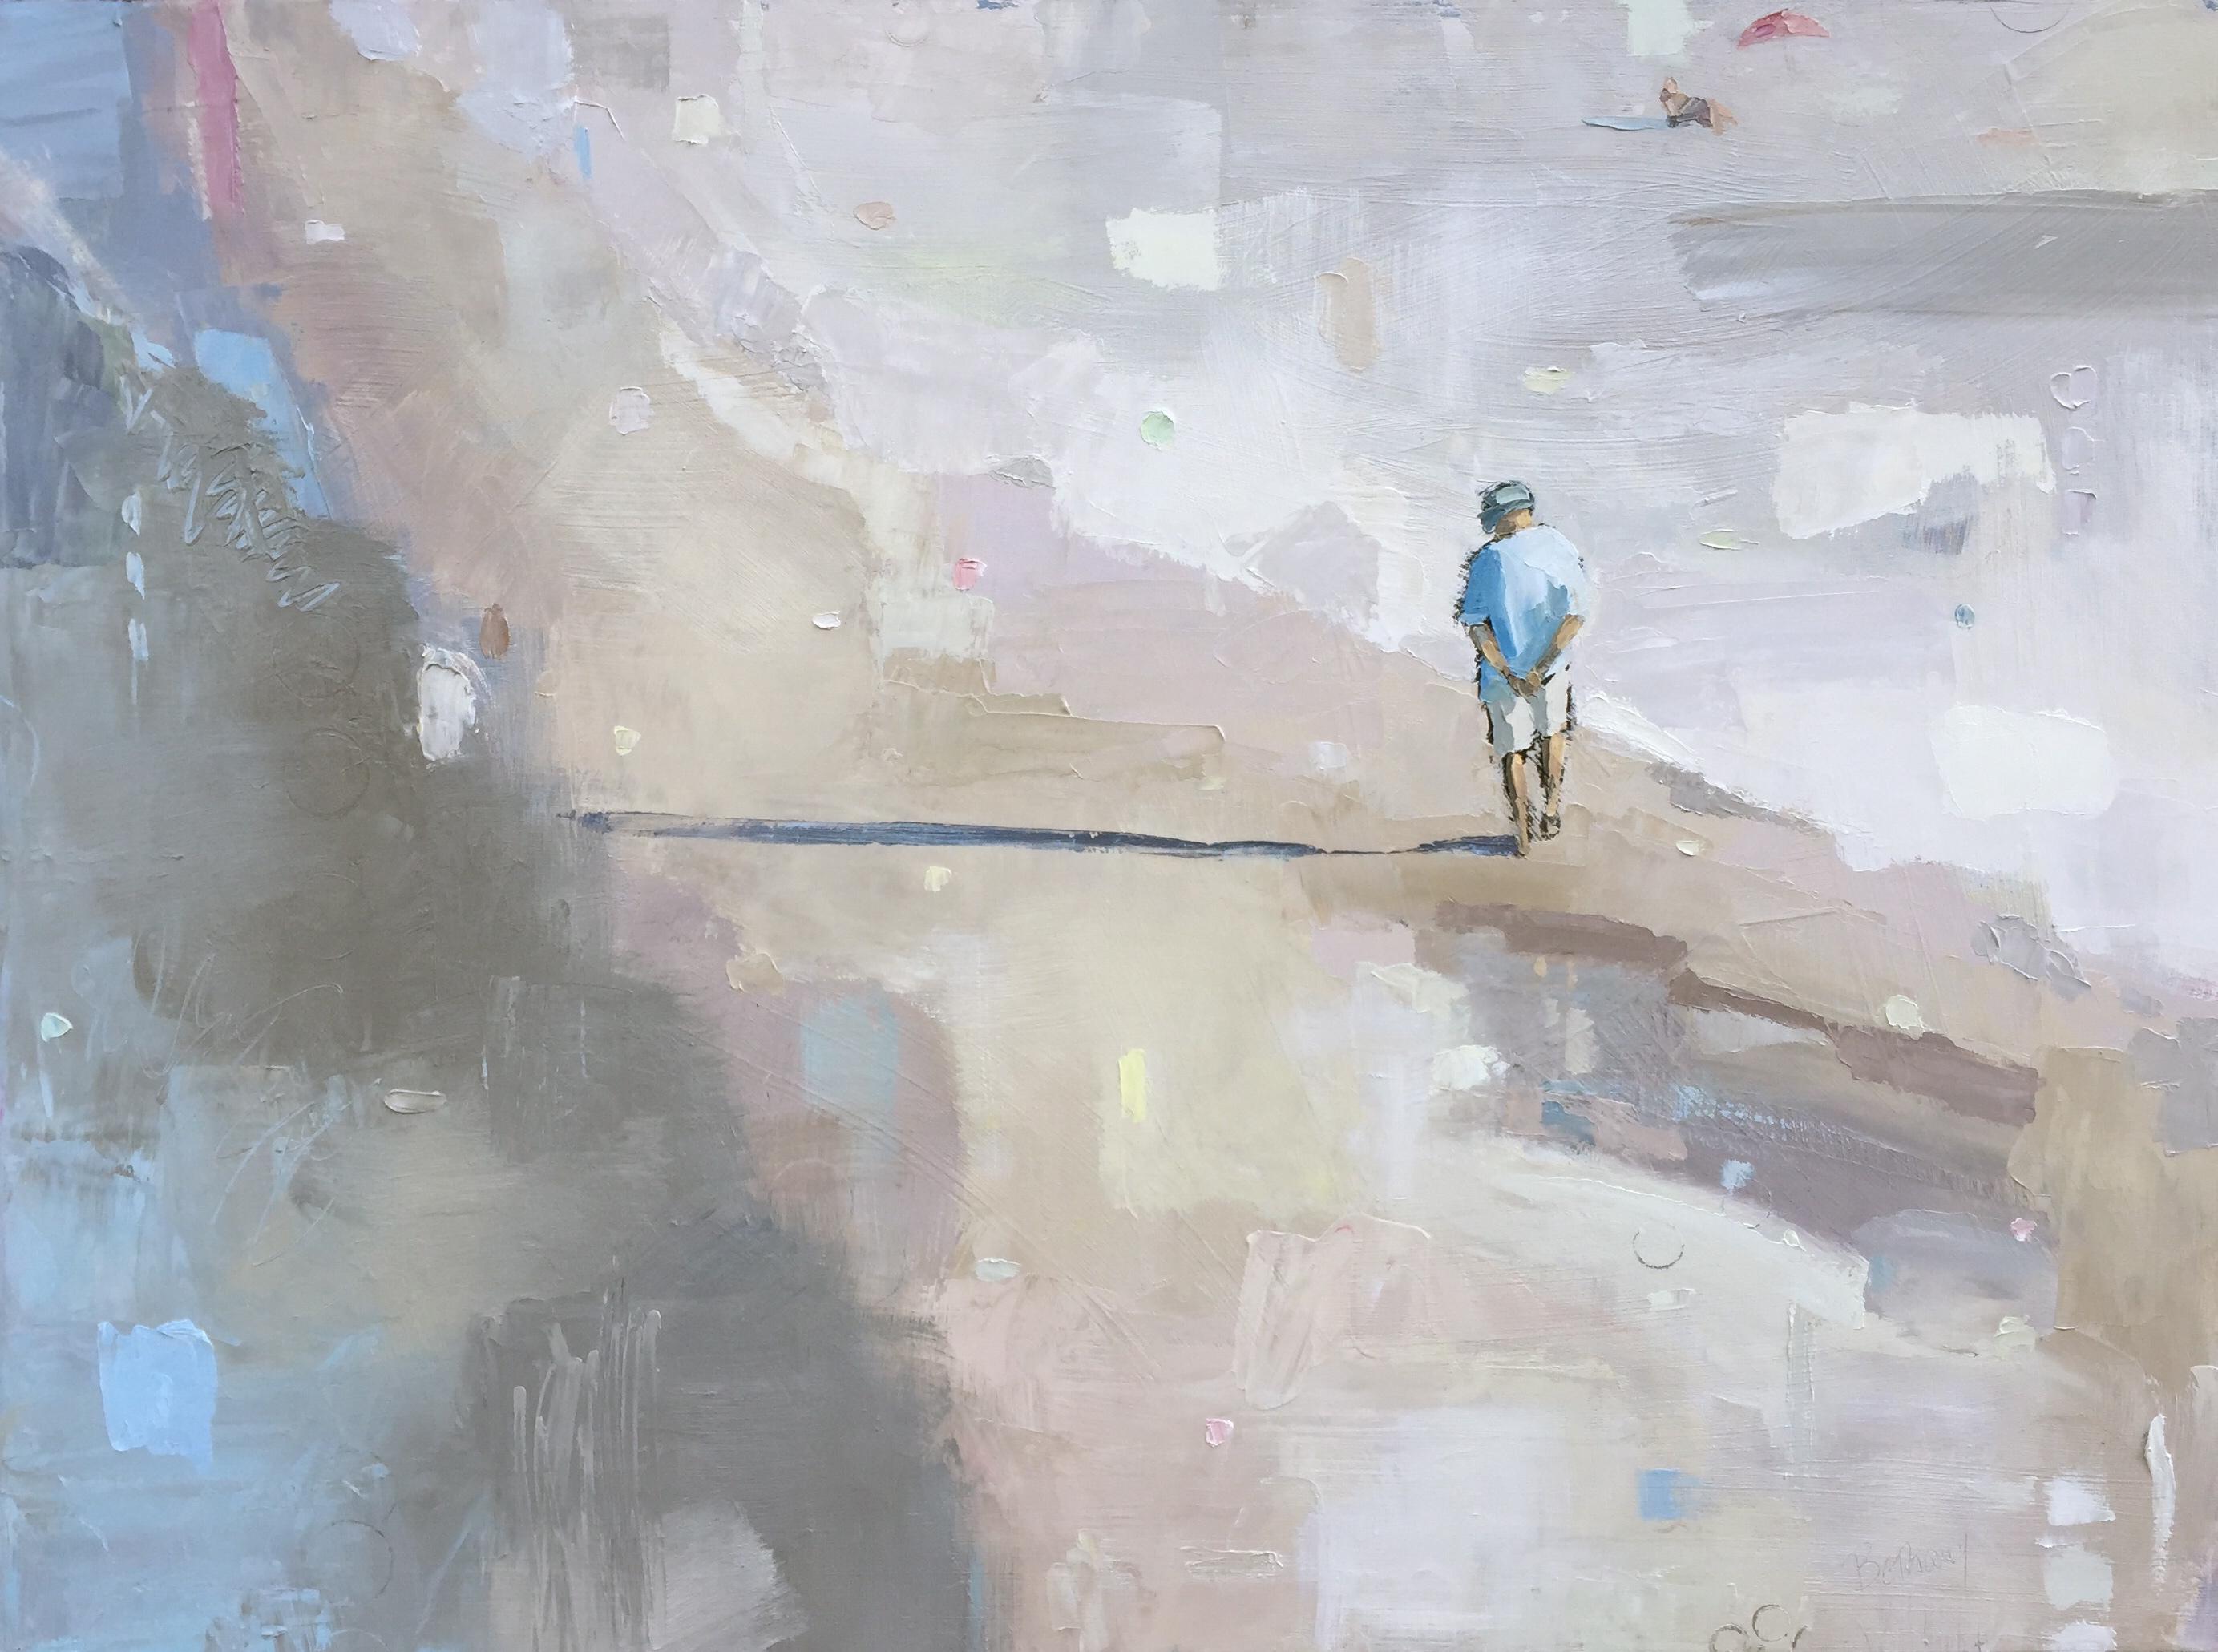 Morning. Walking. Thinking.